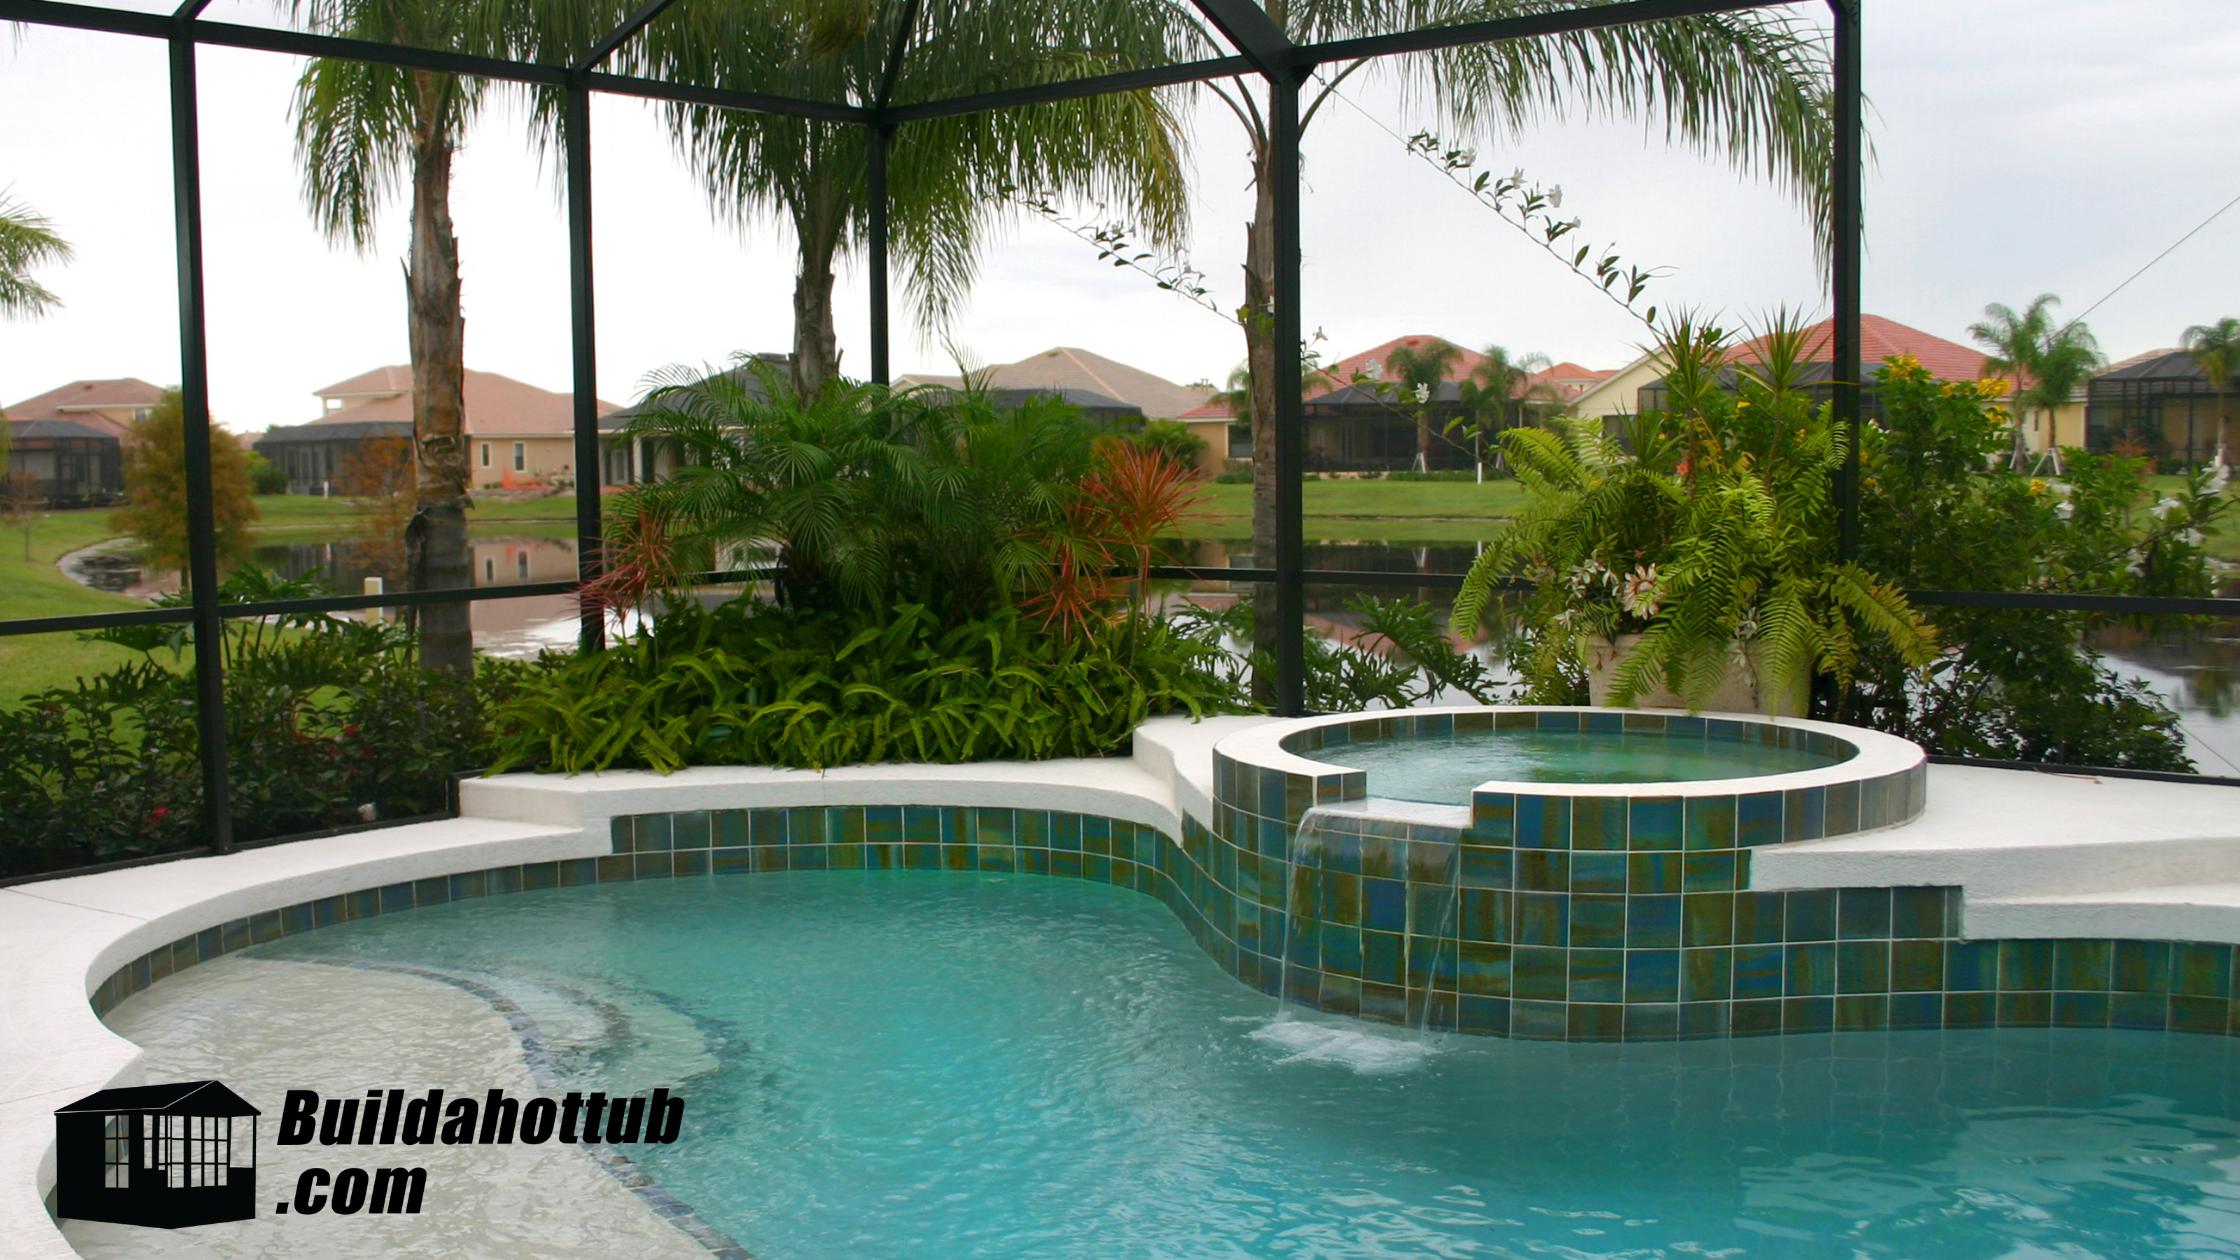 Hot Tub In Swimming Pool